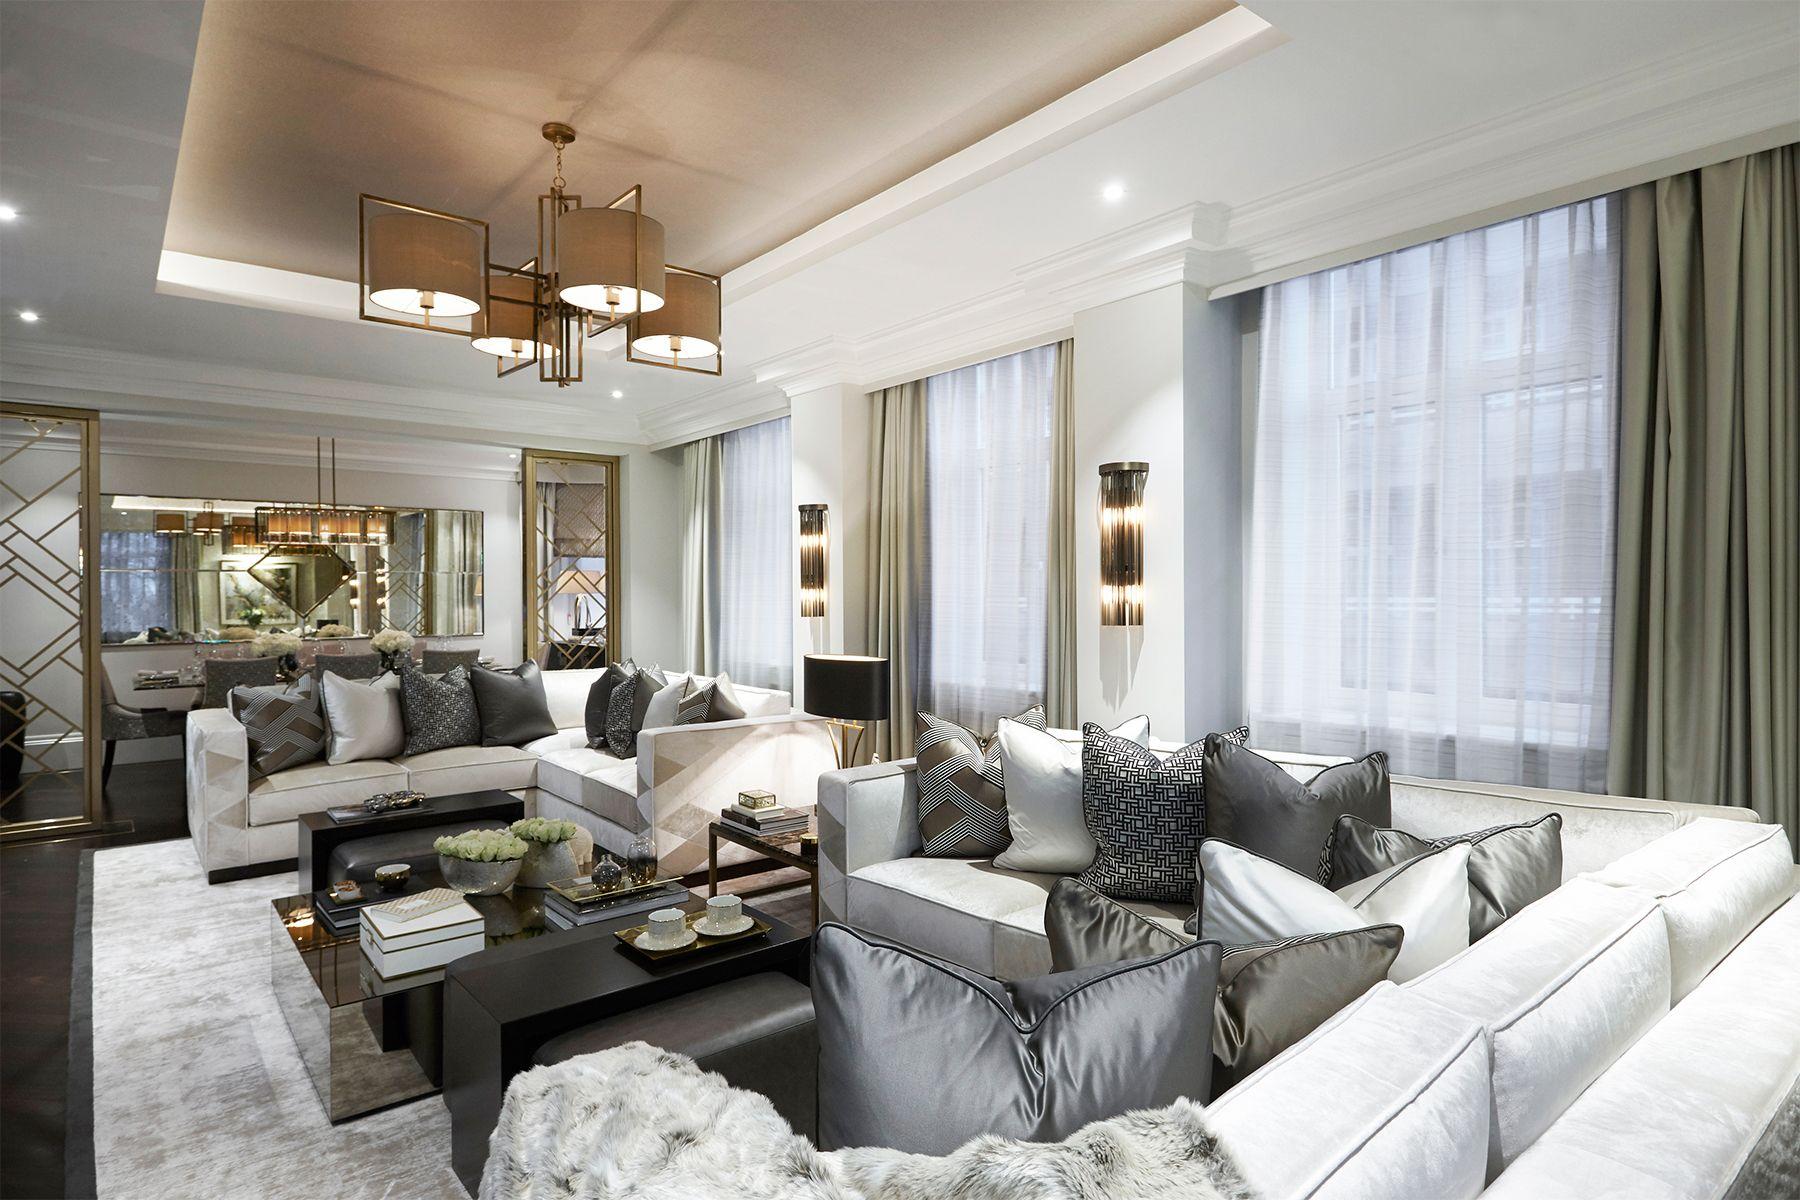 Boscolo High End Luxury Interior Designers In London Klasyczne Pinterest Blog Wallpaper